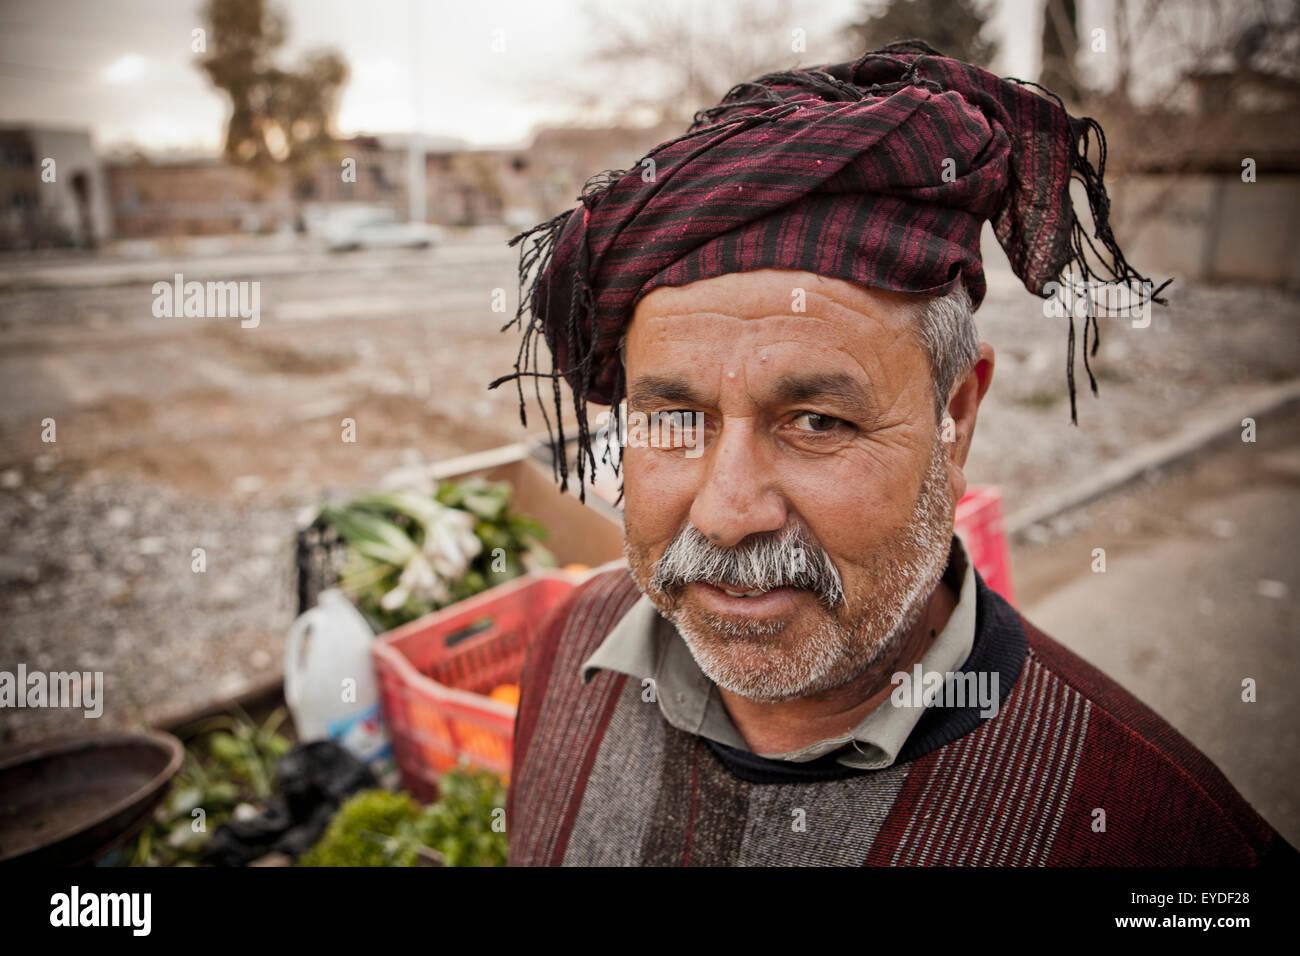 Portrait Of A Kurdish Street Vendor, Sulaymaniyah, Iraqi Kurdistan, Iraq - Stock Image